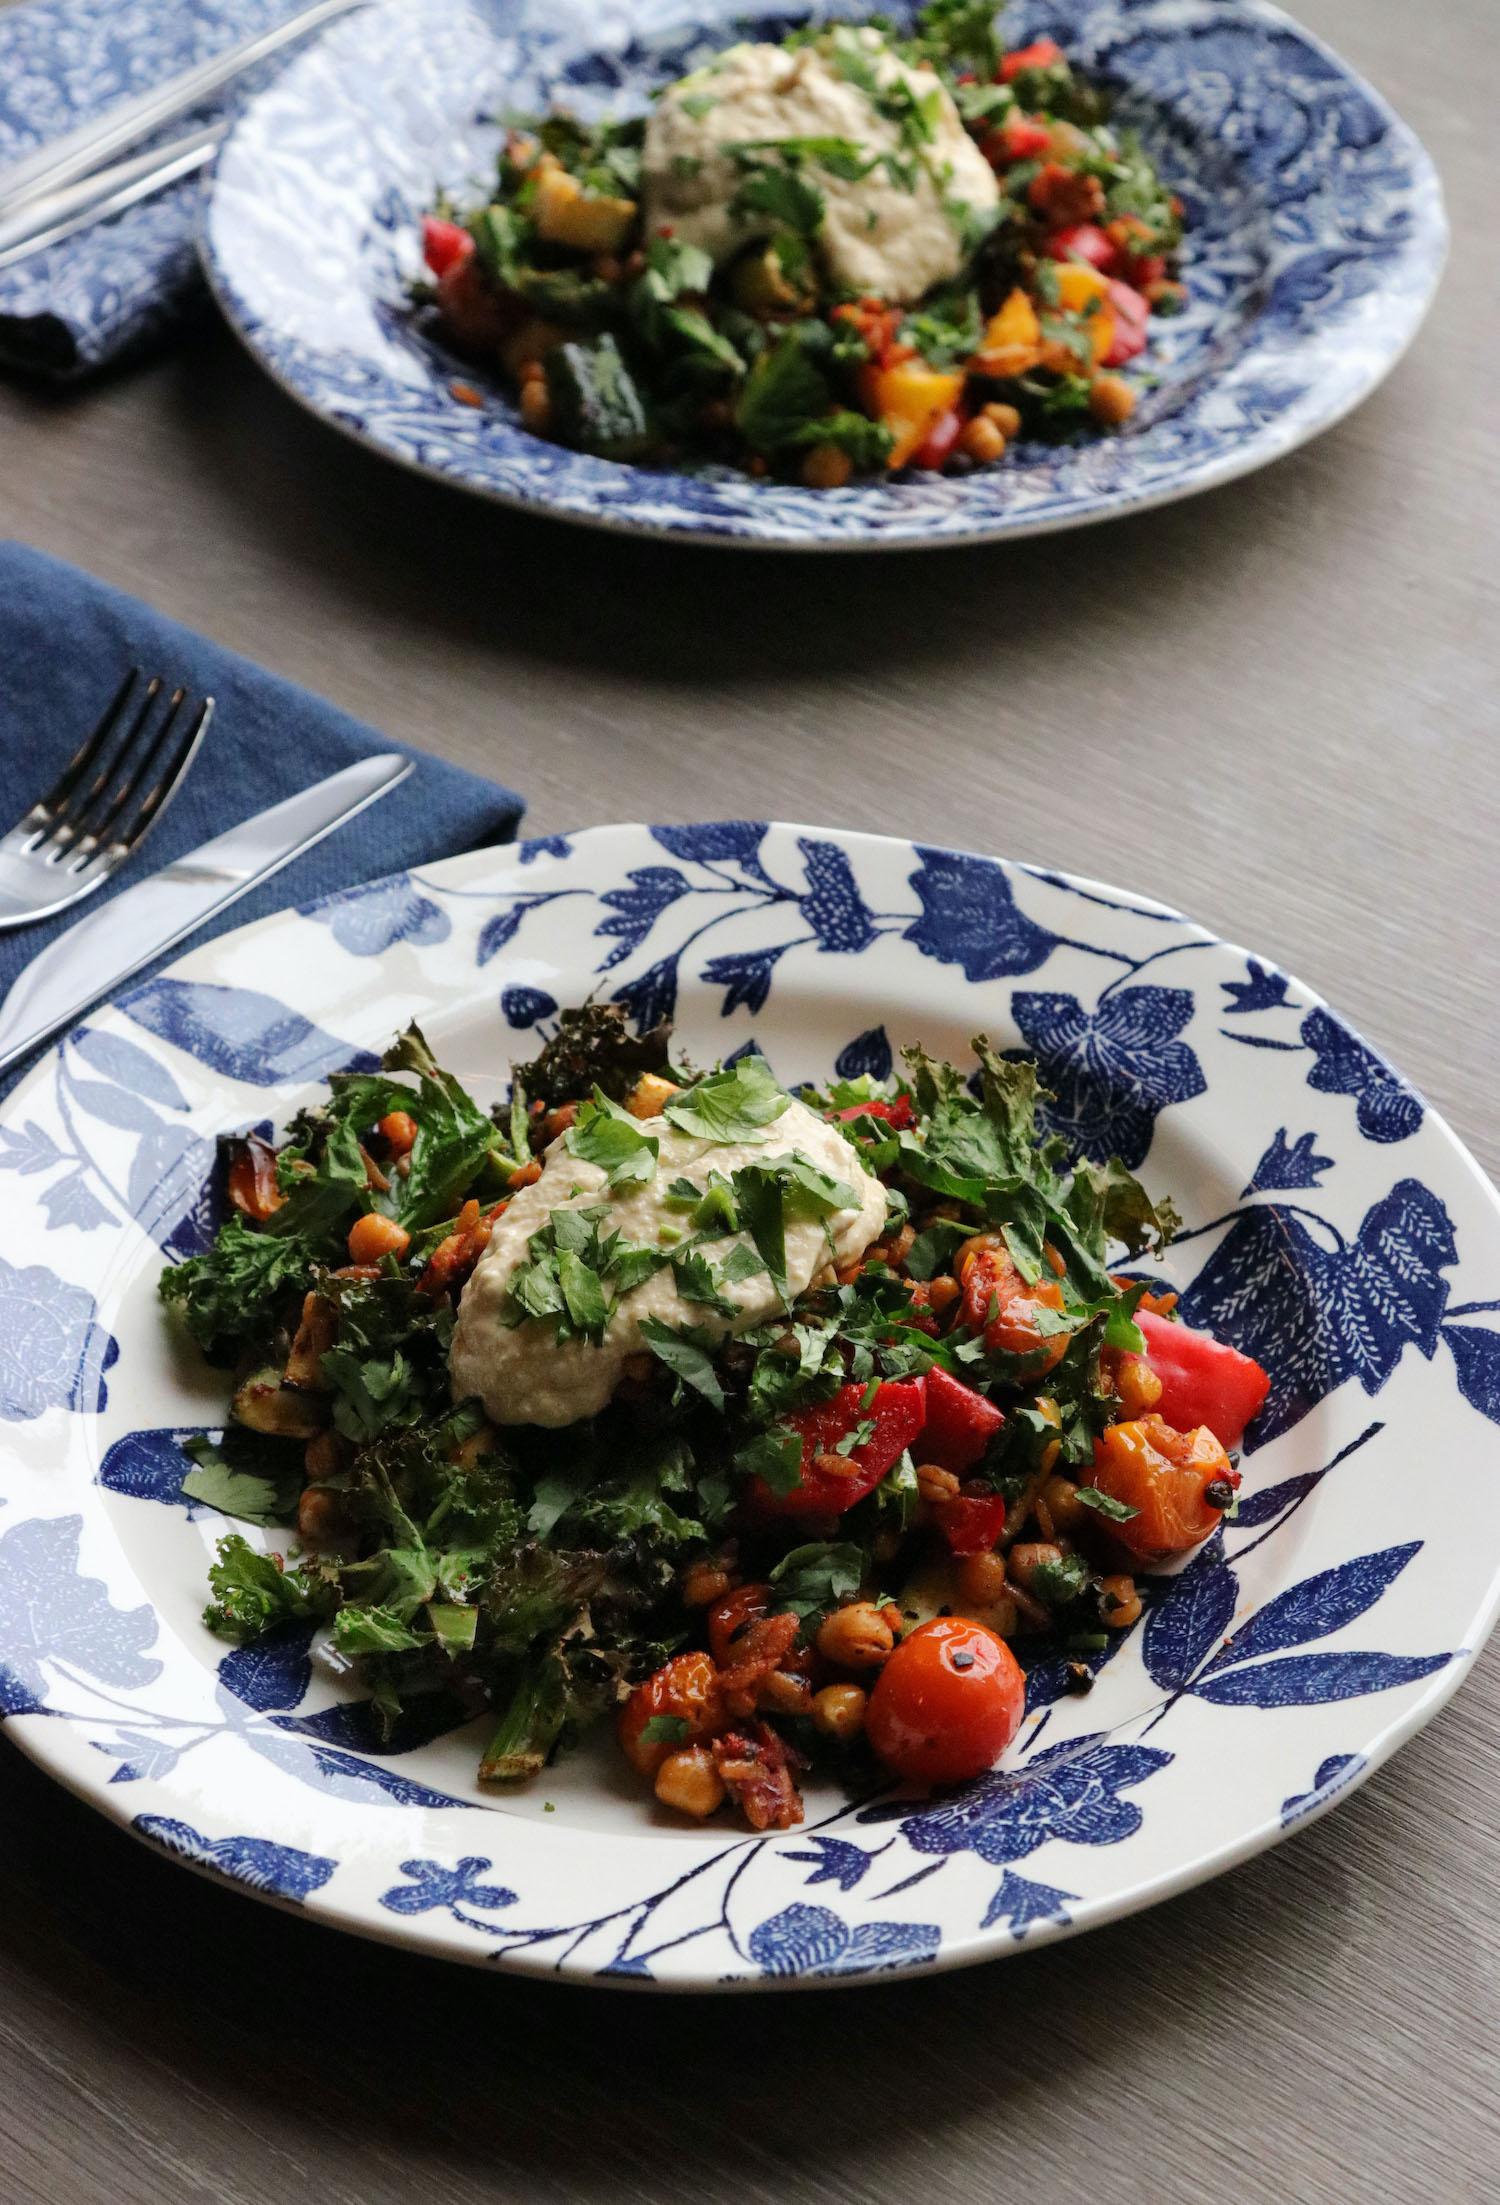 Vegan Chickpea & MediterraneanVeg Bake - Recipe Notes - Burleigh X Ralph Lauren - Humphrey Munson Blog